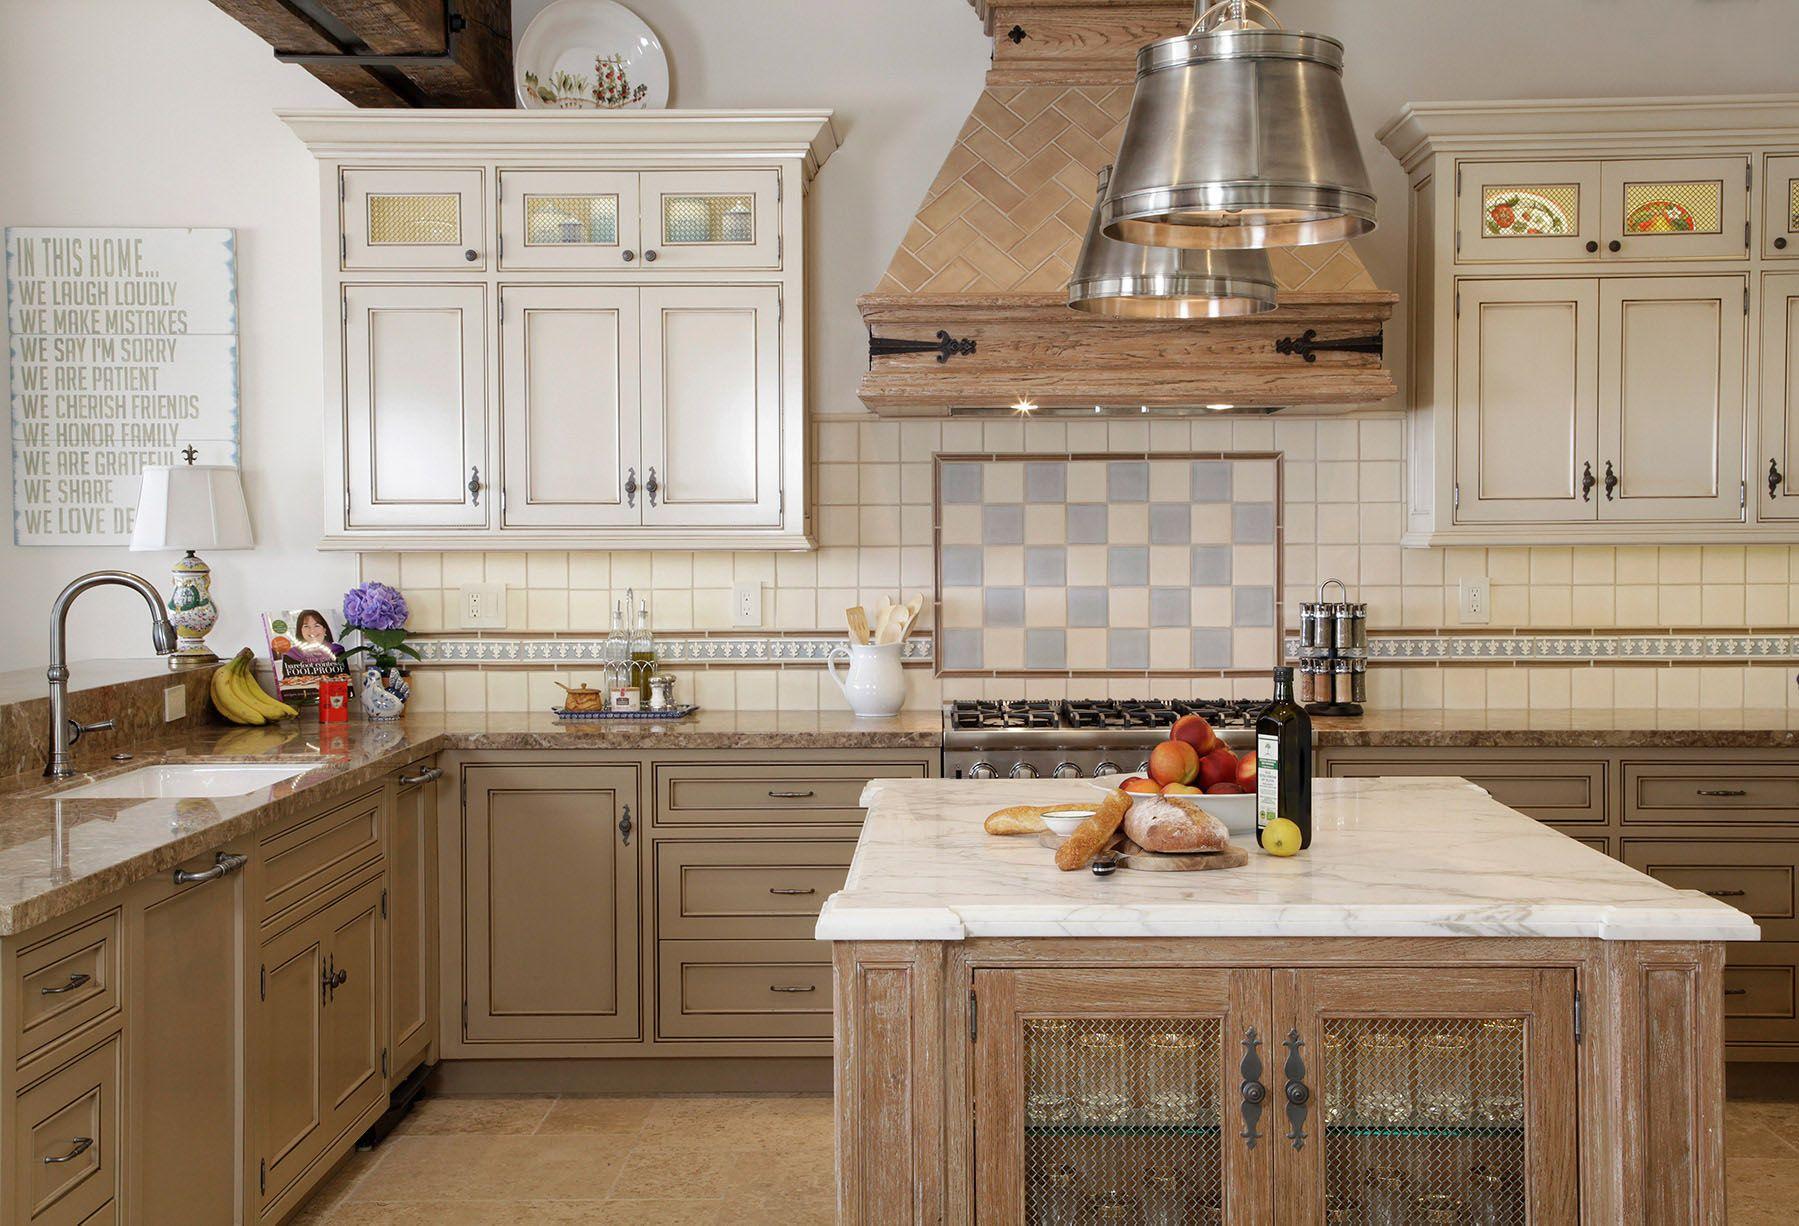 Kitchens & Dining 39.jpg